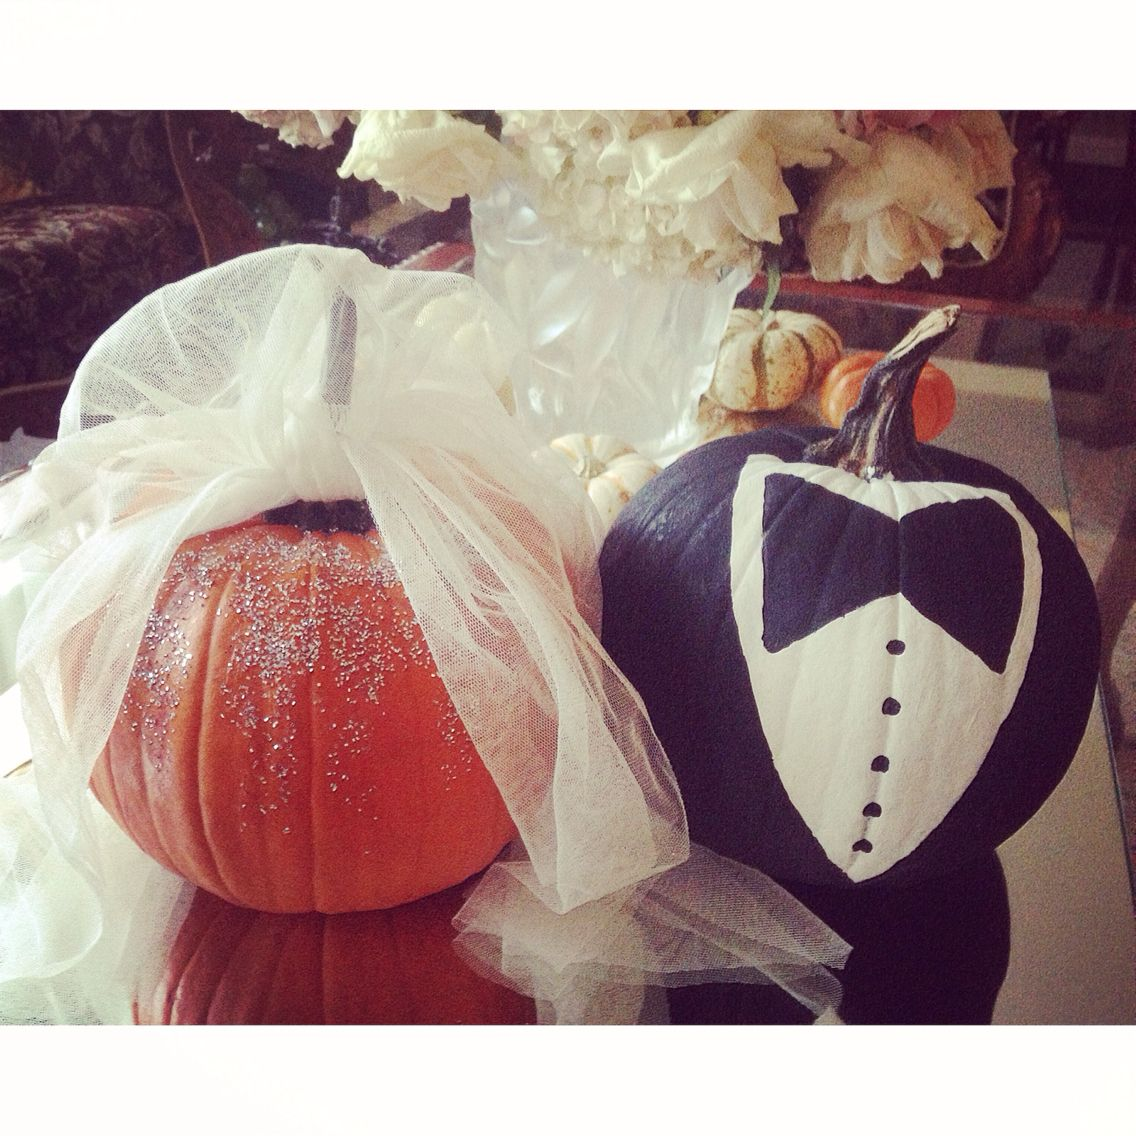 Halloween Wedding Pumpkin: Bride And Groom Painted Halloween Pumpkins